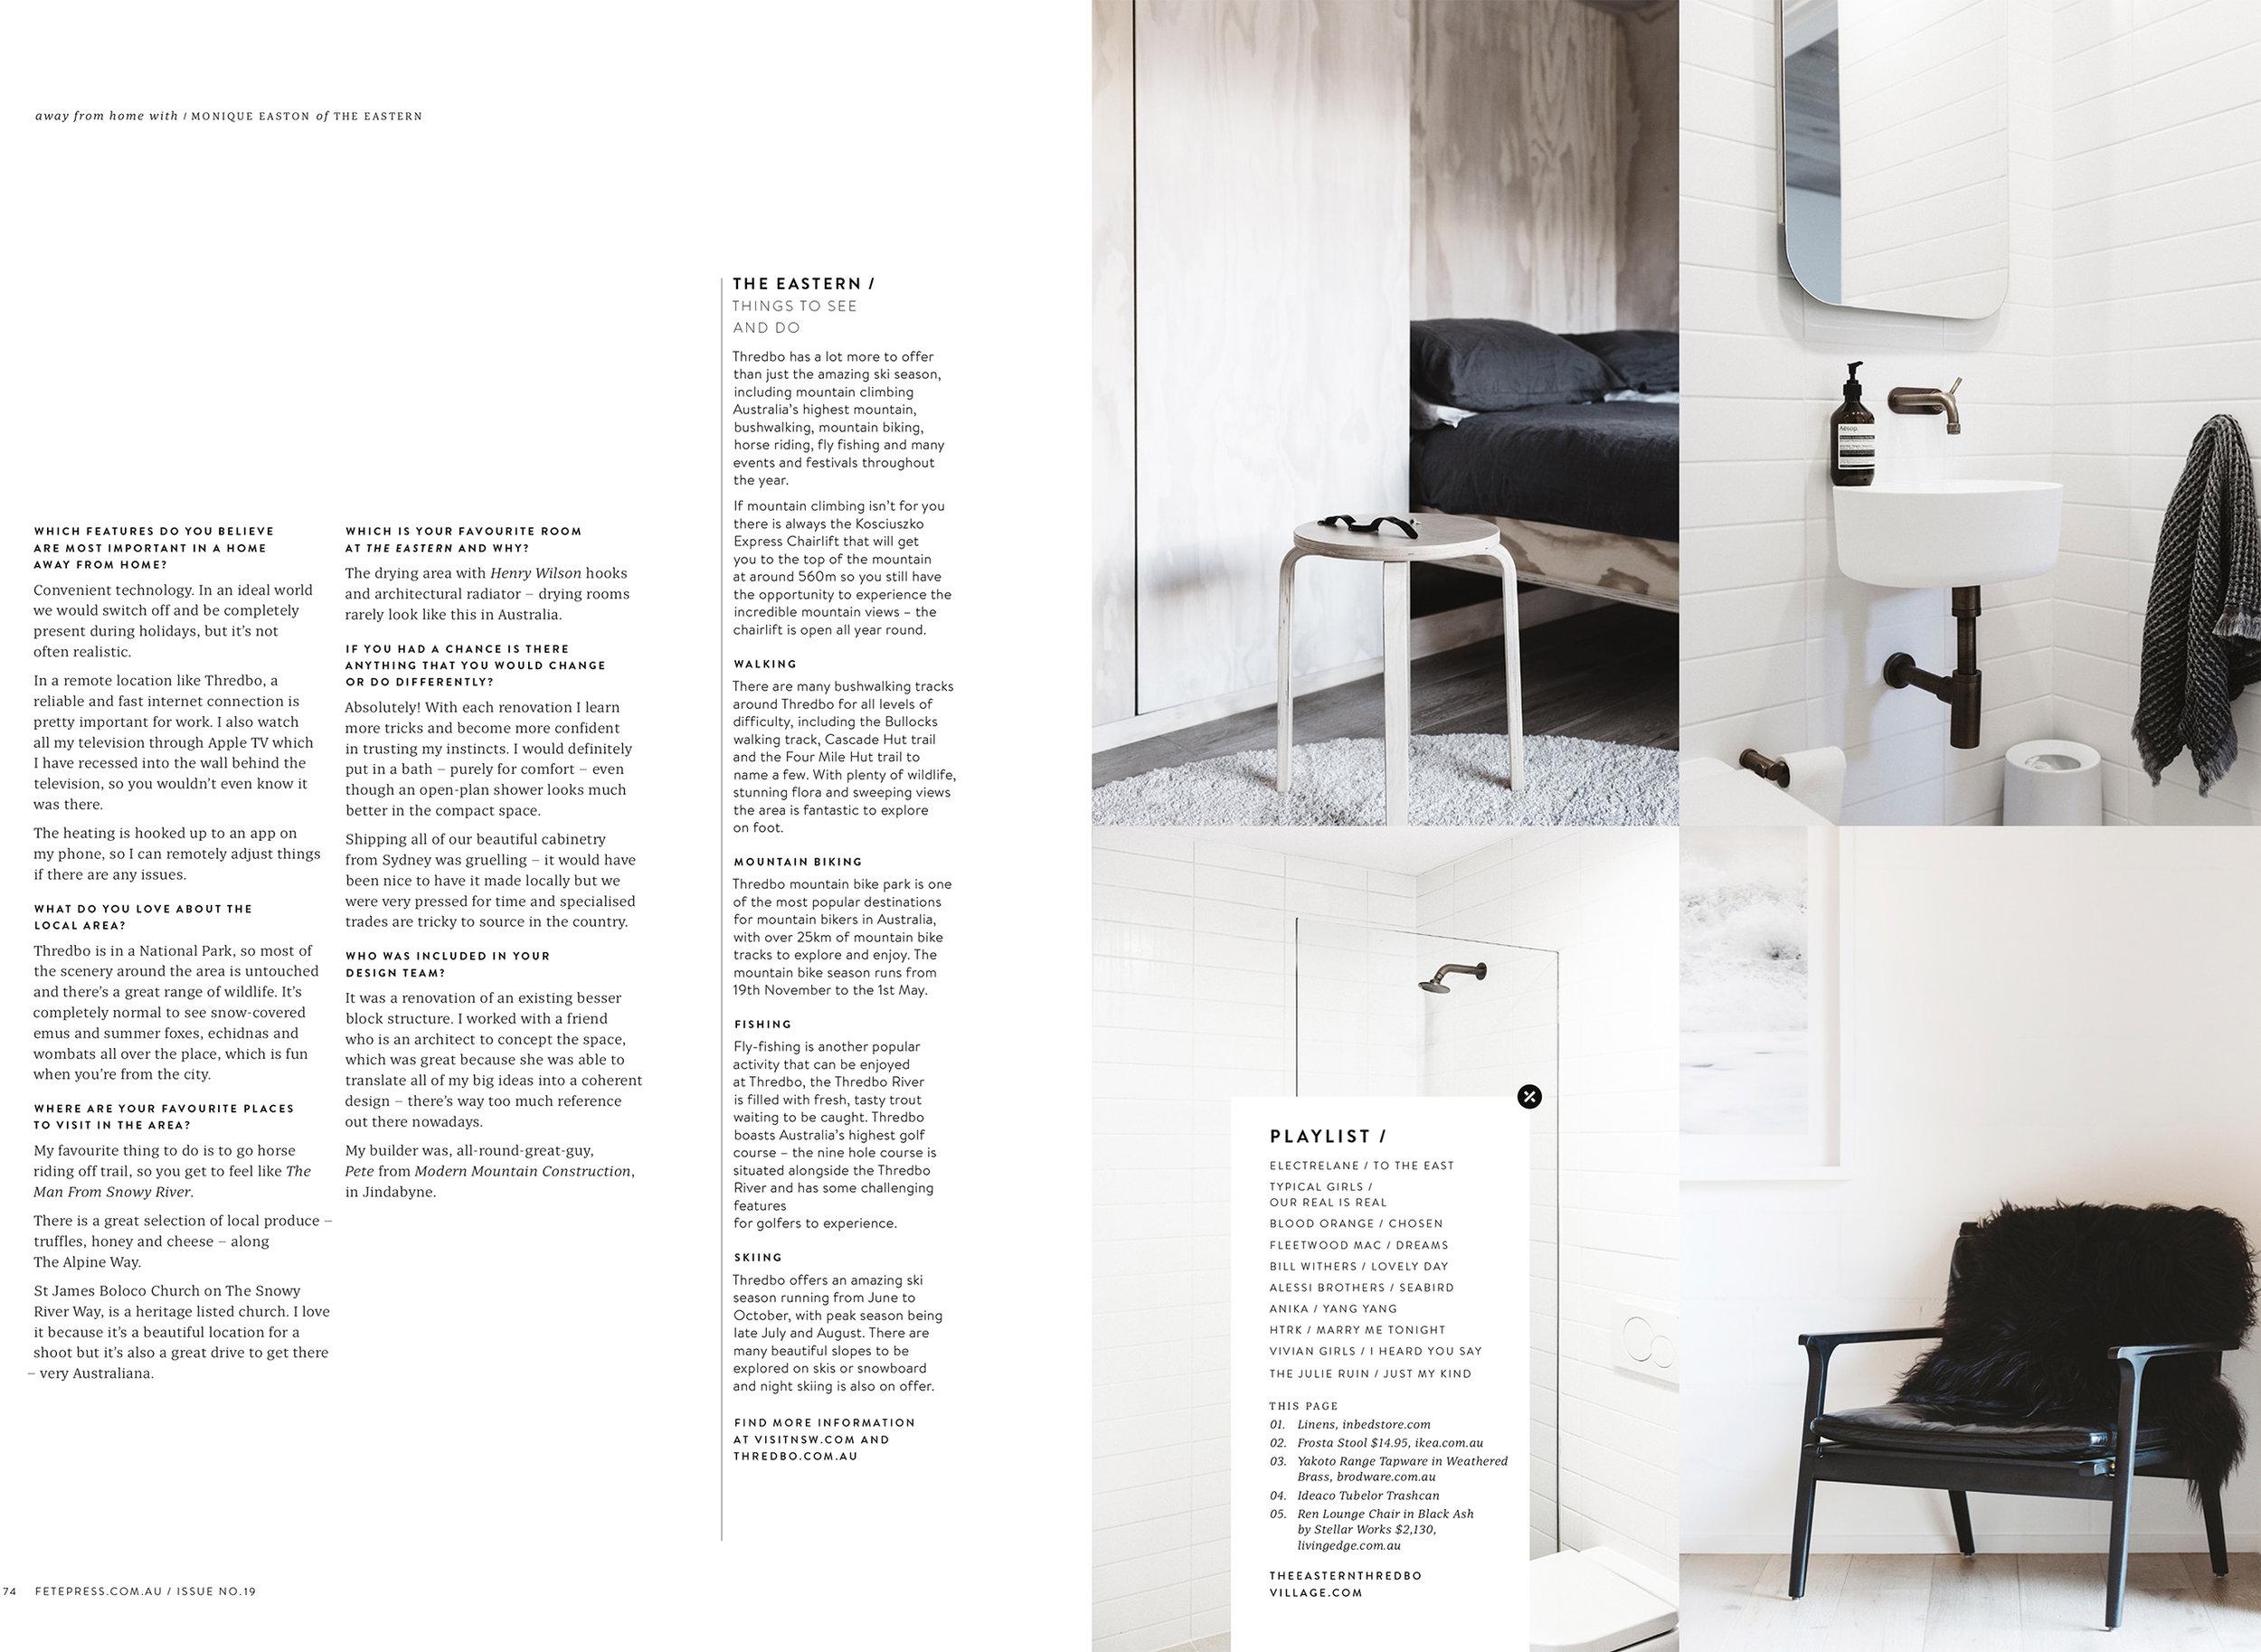 Accommodation_The_Eastern_Thredbo_Village_Fete_Magazine_005